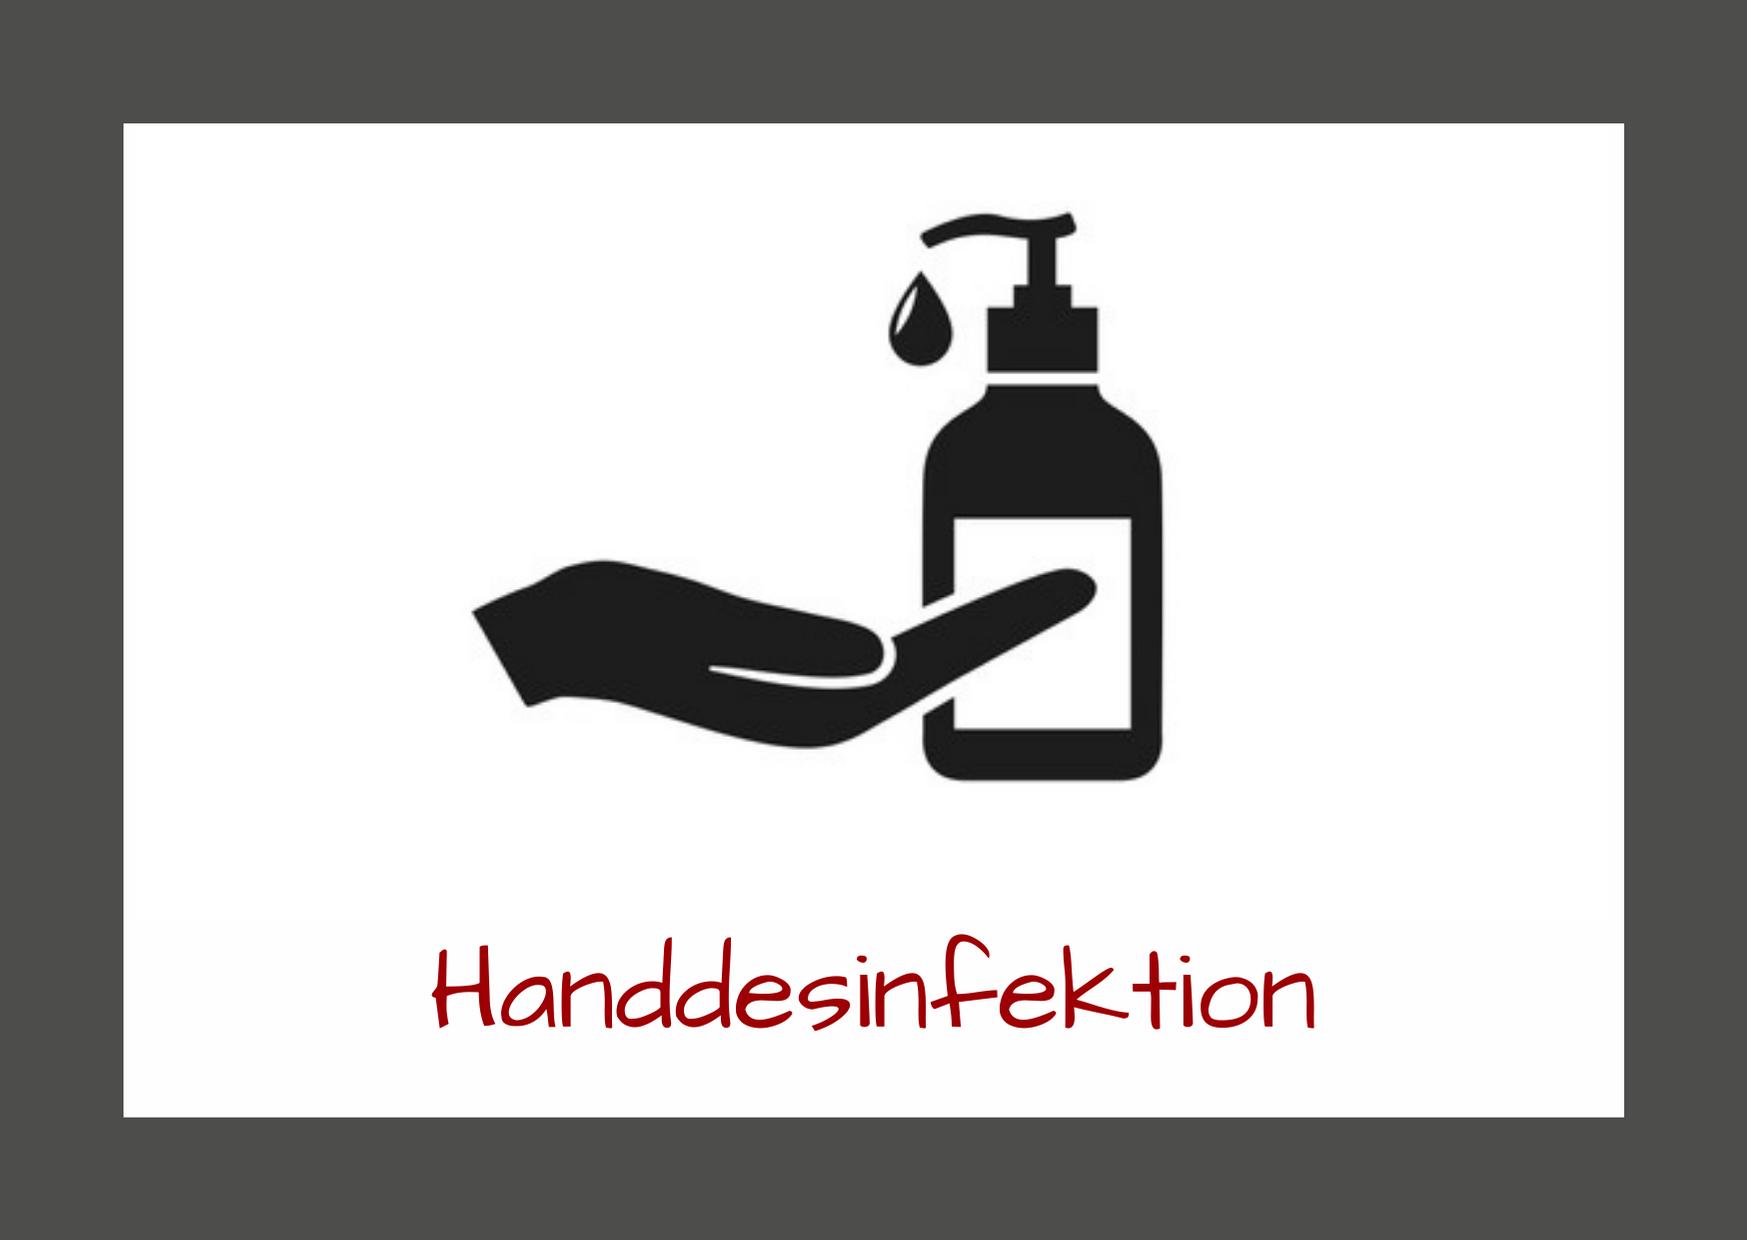 Handdesinfektion - Corona-Sicherheitsmaßnahmen